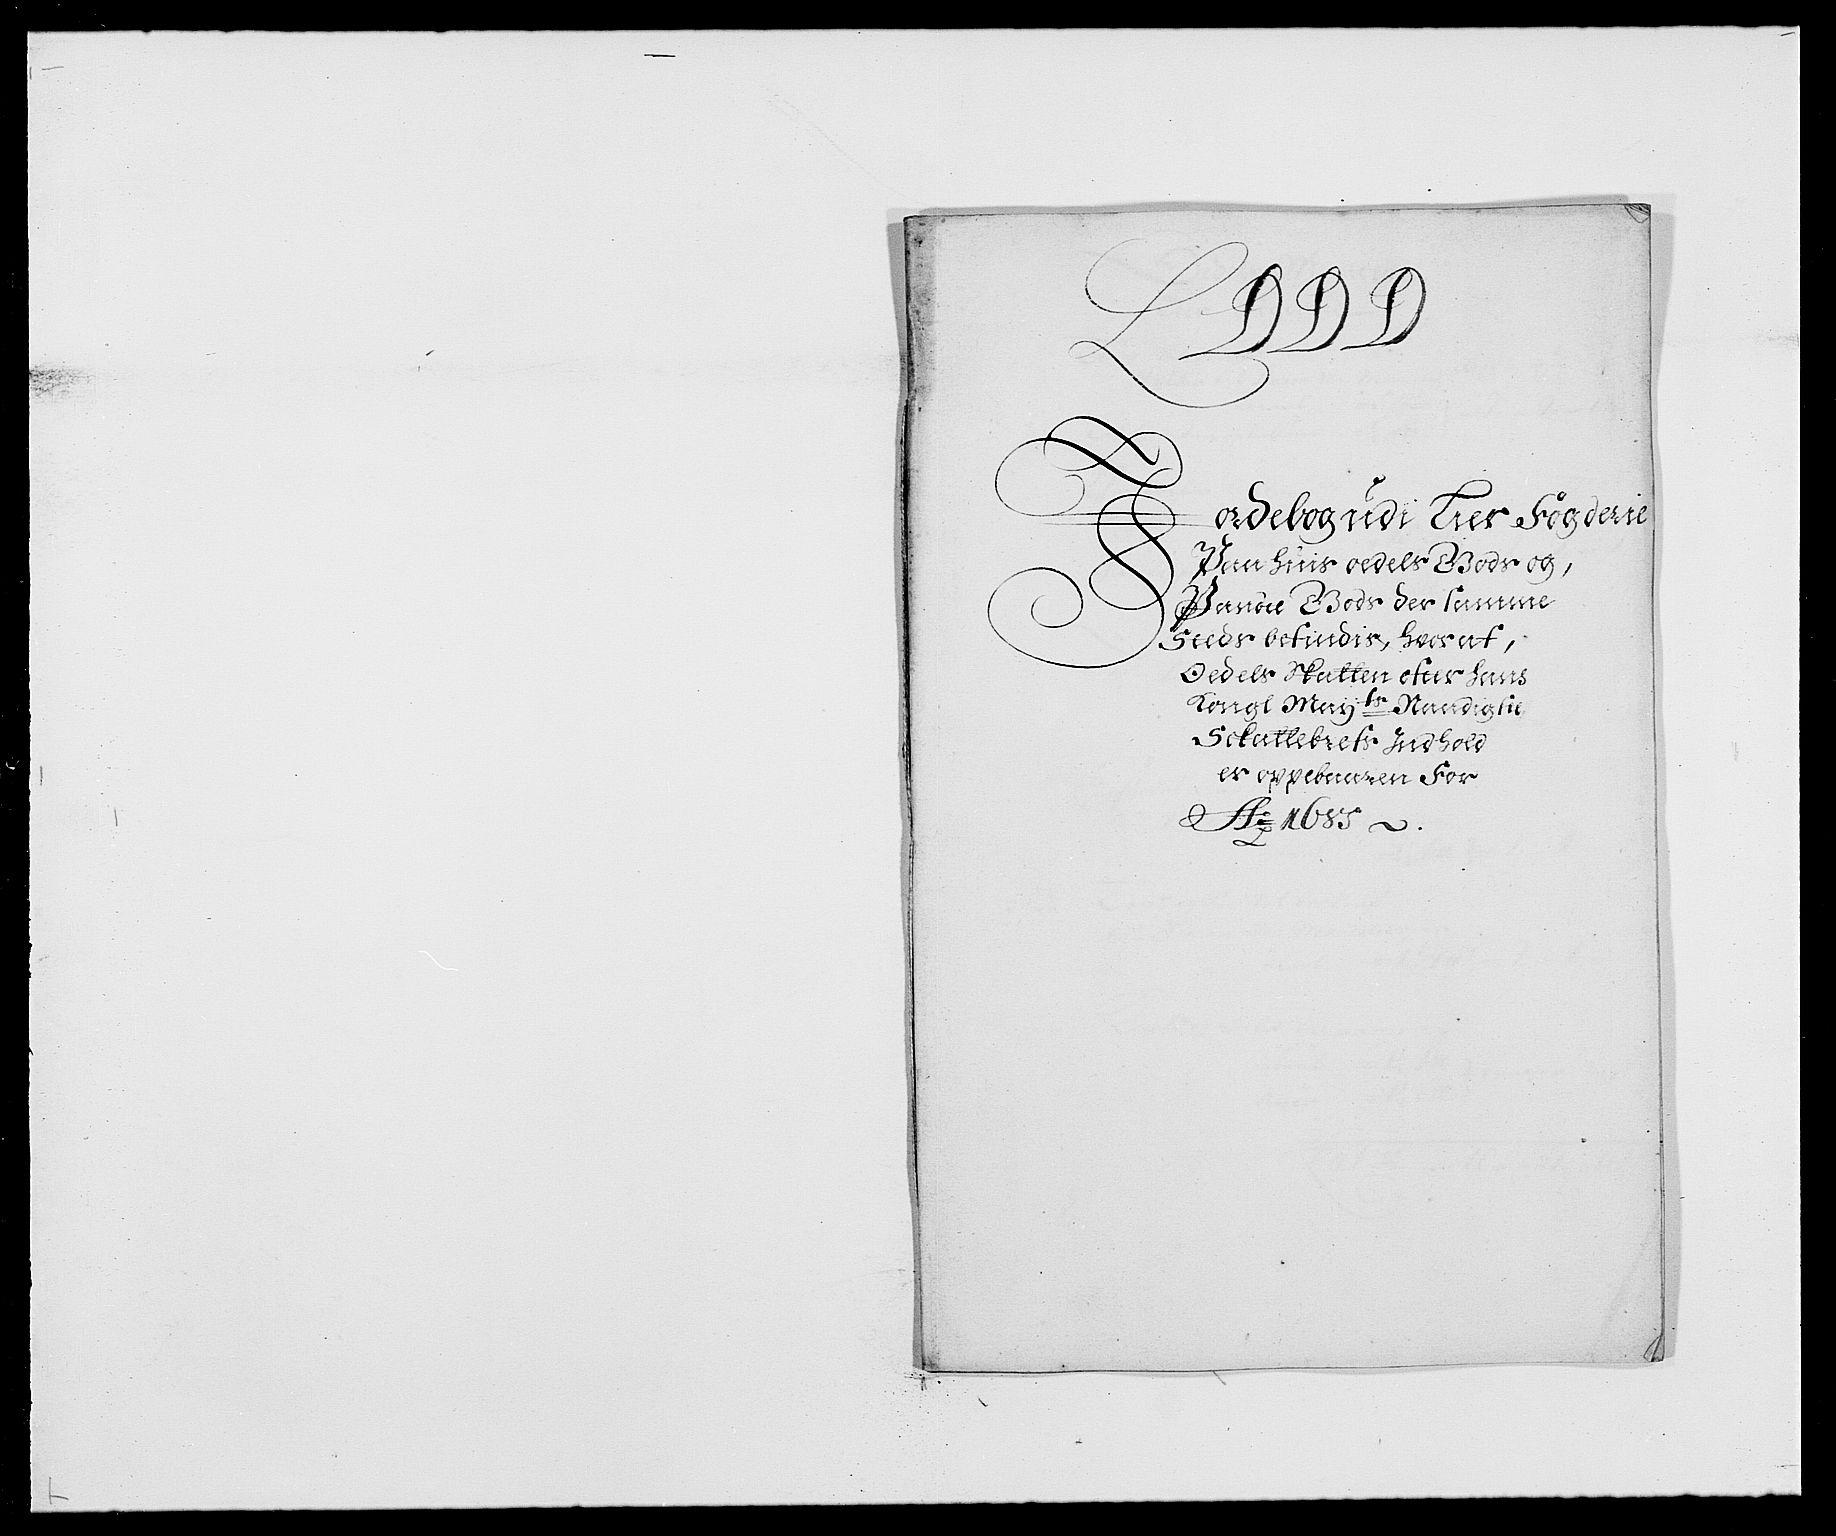 RA, Rentekammeret inntil 1814, Reviderte regnskaper, Fogderegnskap, R27/L1687: Fogderegnskap Lier, 1678-1686, s. 186